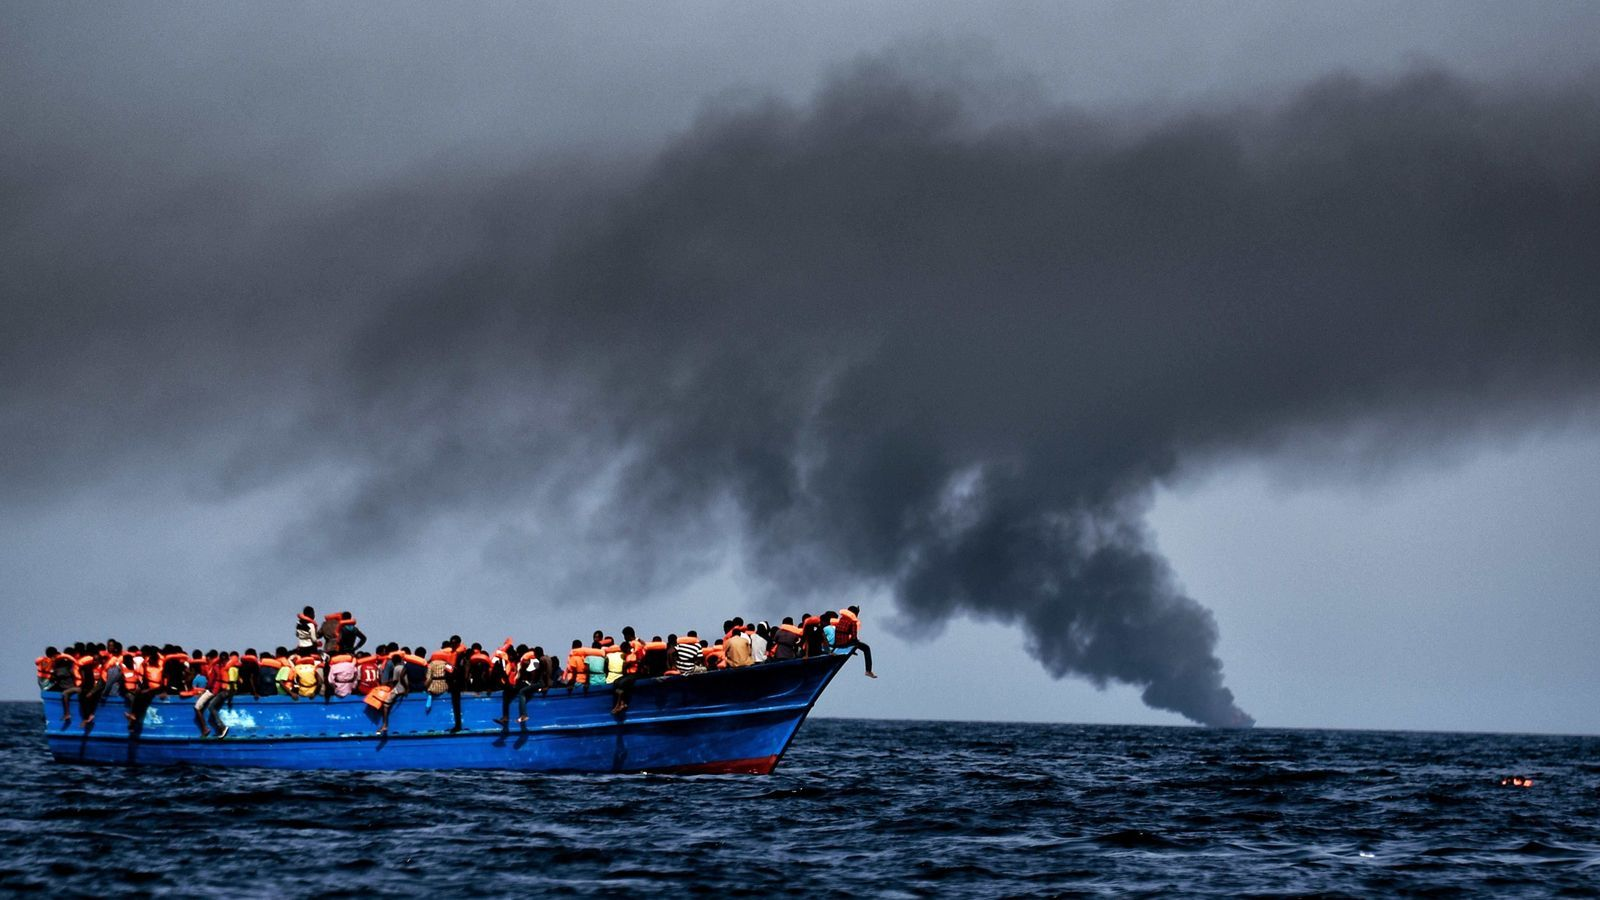 REFUGIADOS-UE II - Página 2 Grup-refugiats-deriva-esperen-rescatats_1662443857_34457163_651x433